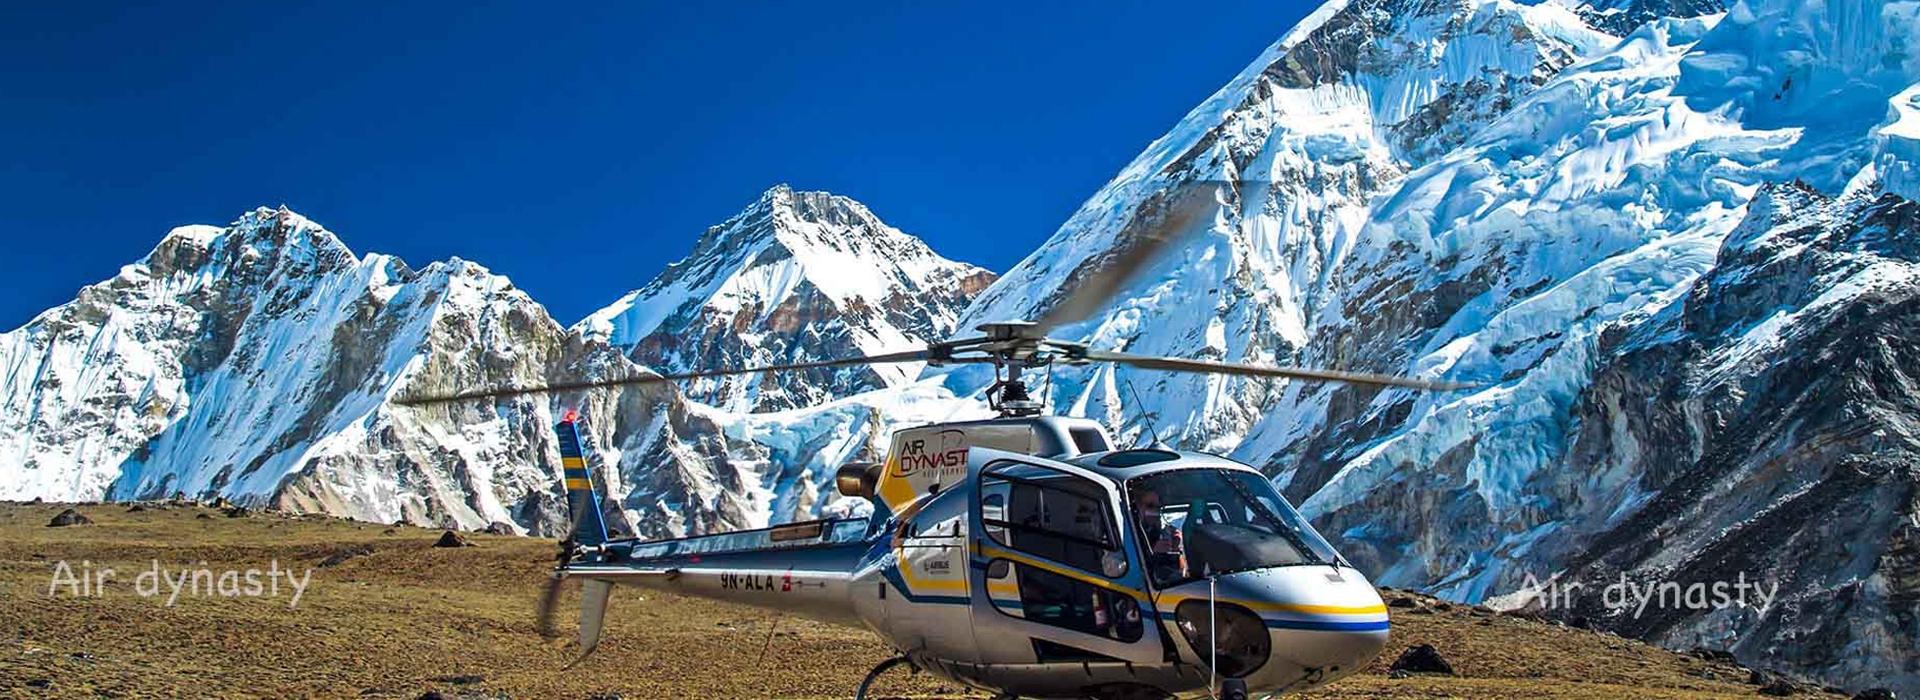 Mountain Flight(Mt. Everest Flight) Day Tours